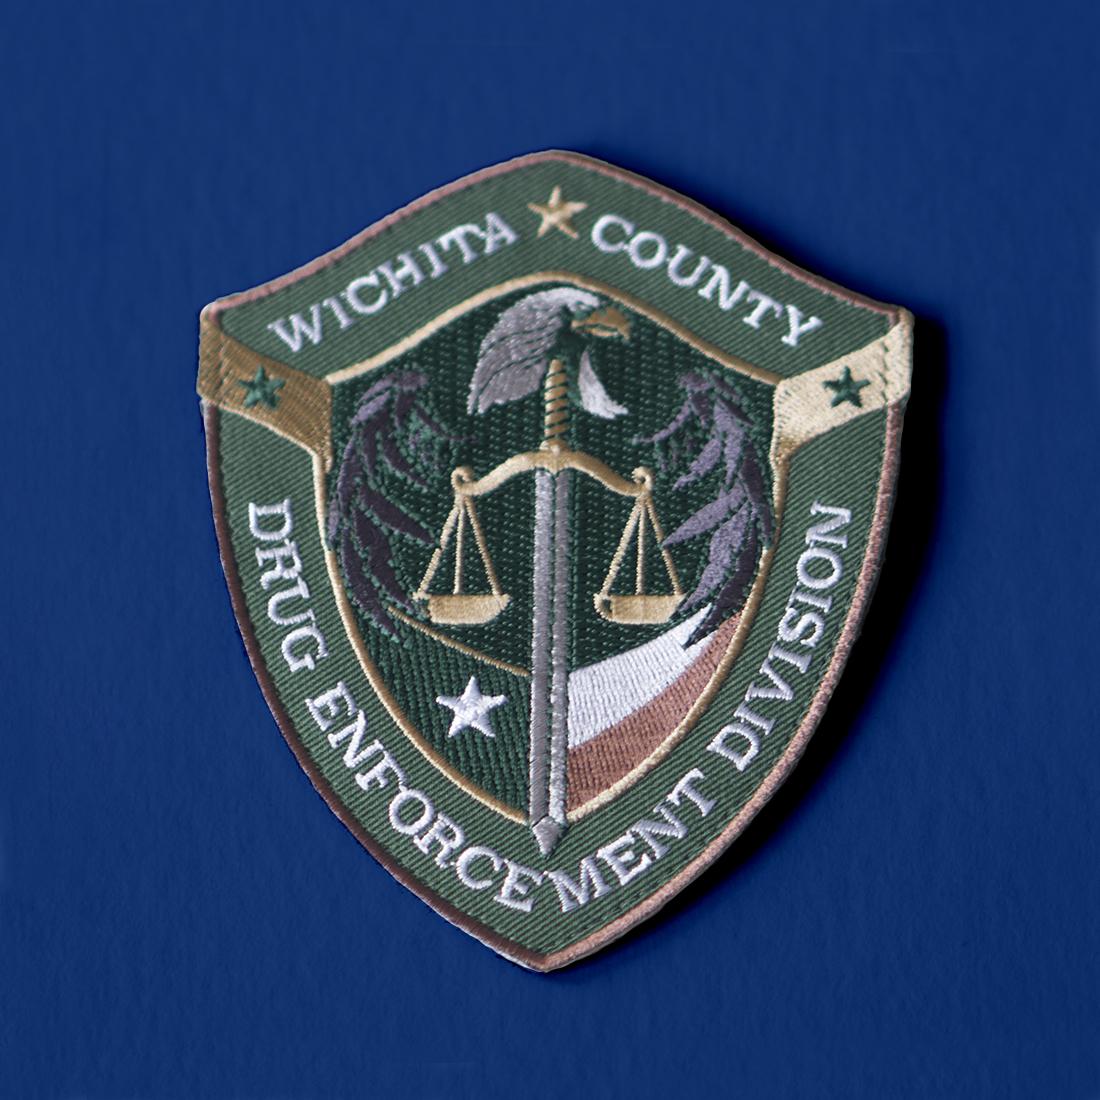 Wichita Falls District Attorney patch design